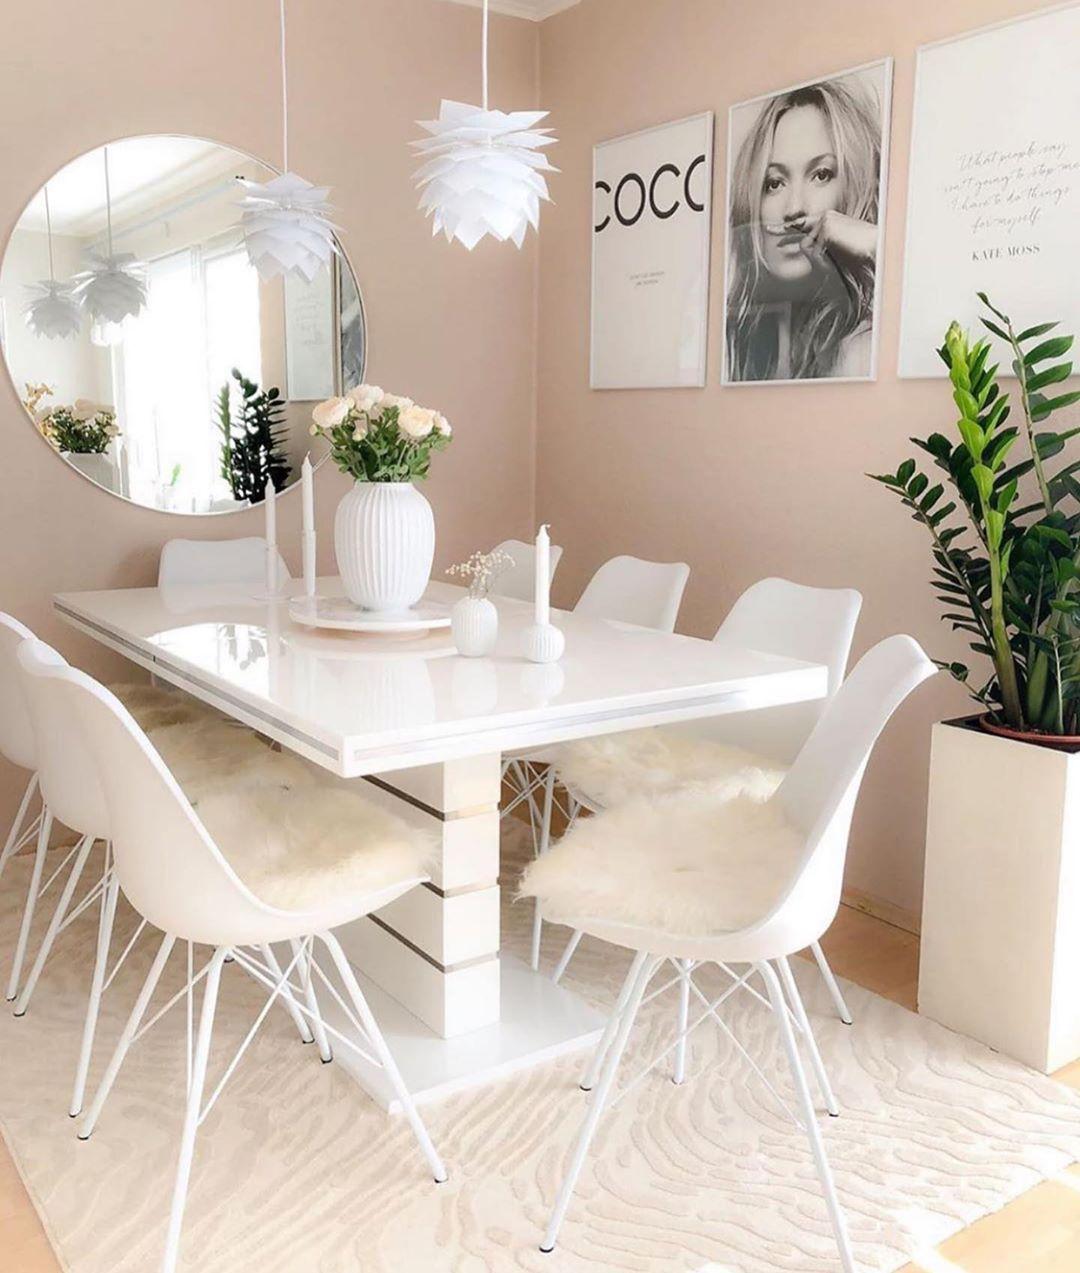 Inspi Deco On Instagram Scandinave Home Inspi Nihals Sweet Home Picoftheday Instalike Liv Murs De Salle A Manger Idees De Decor Rideaux A Nouettes